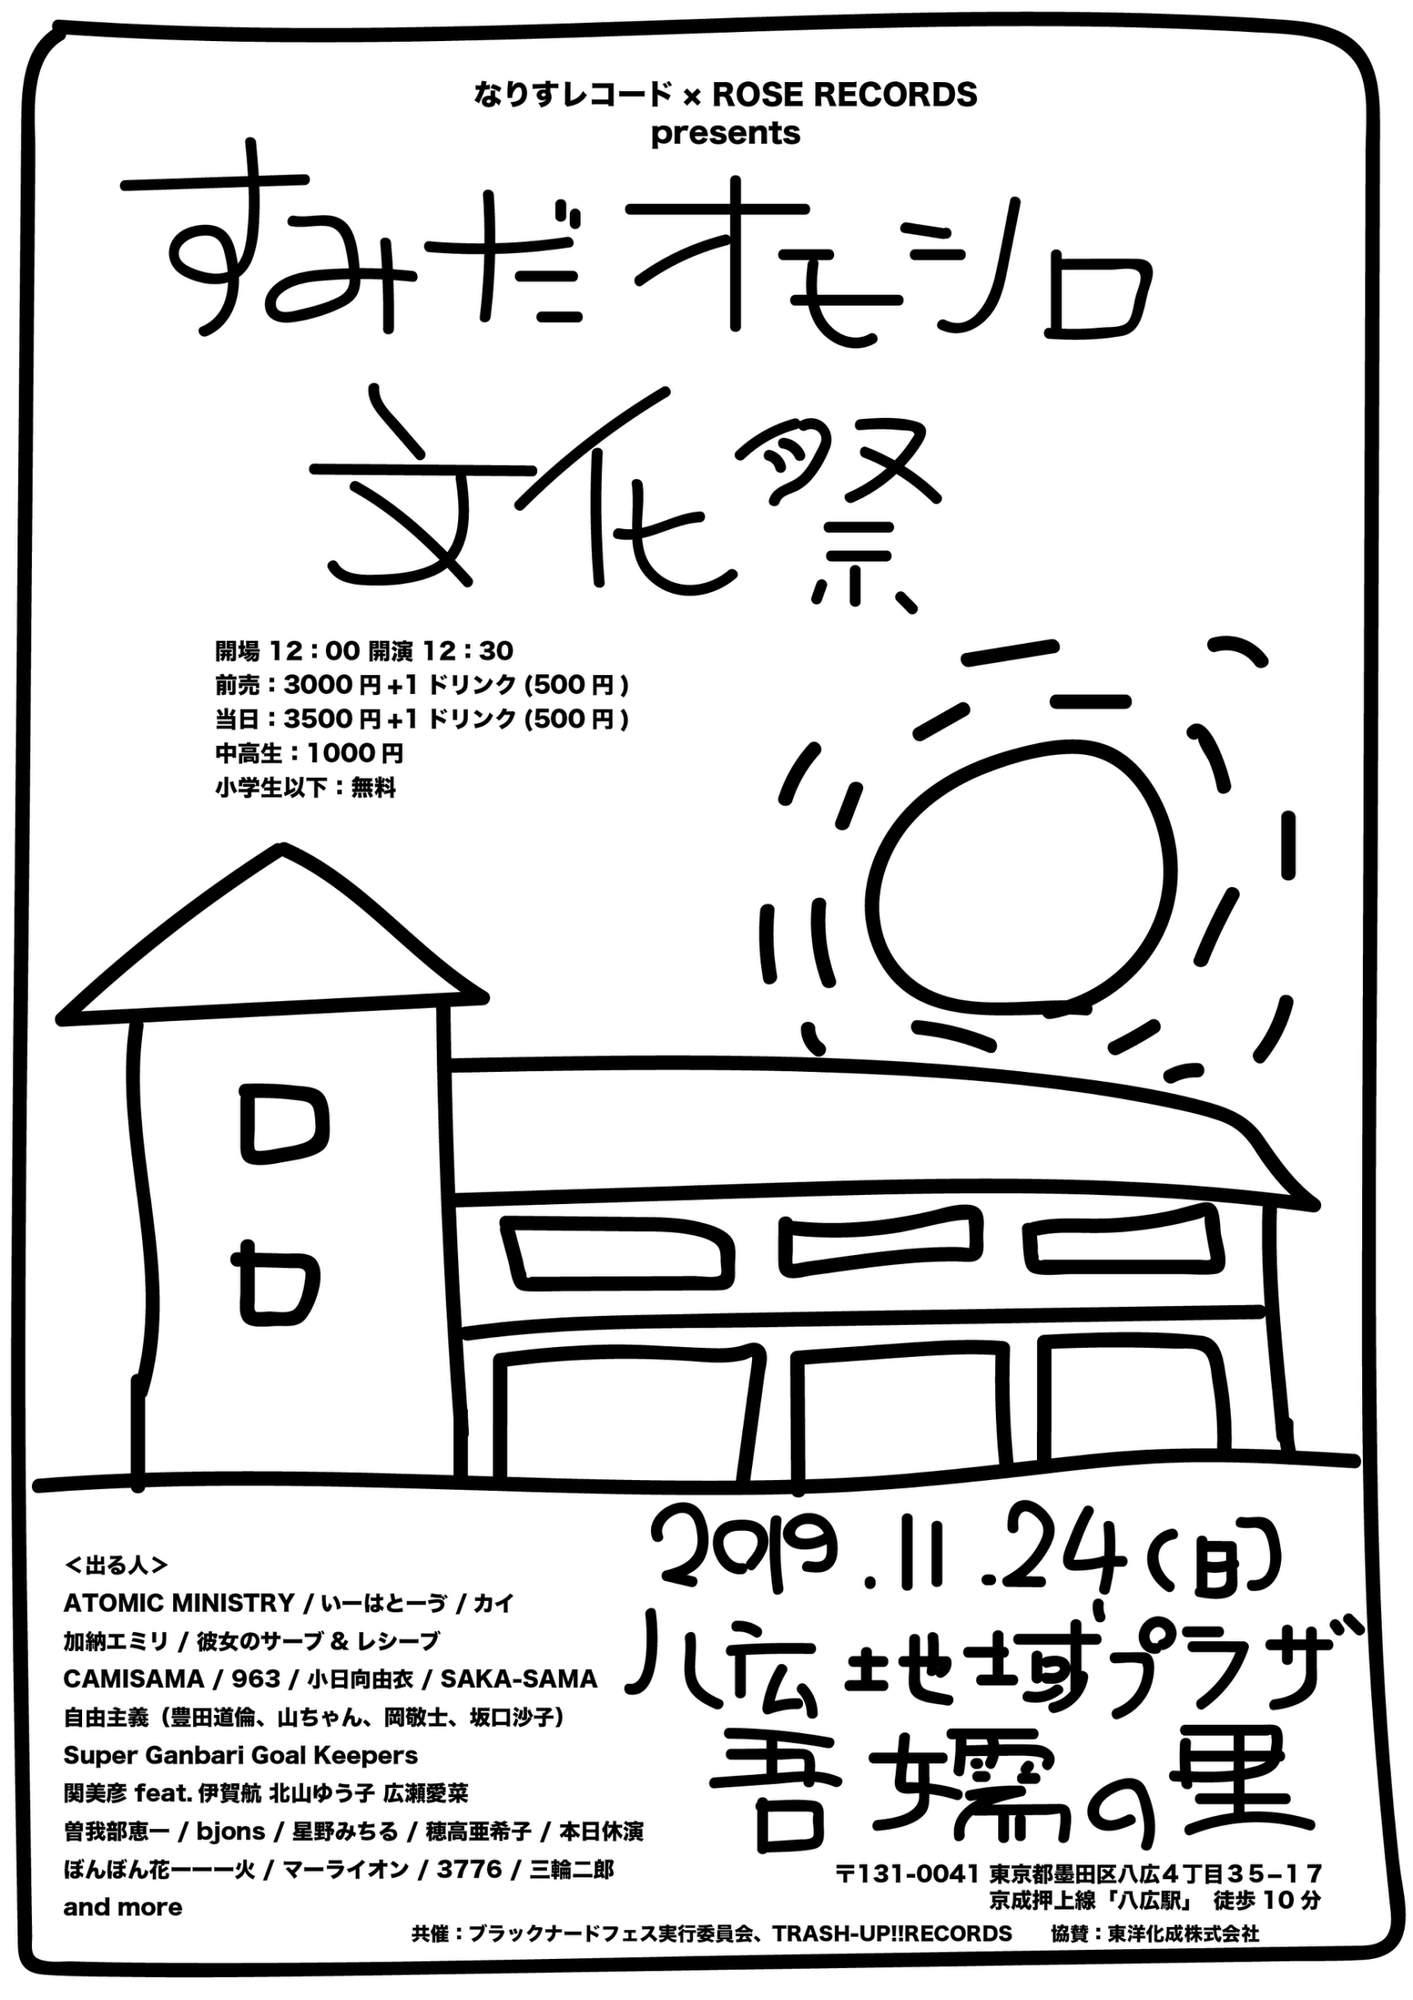 http://rose-records.jp/files/20191016120642.jpg